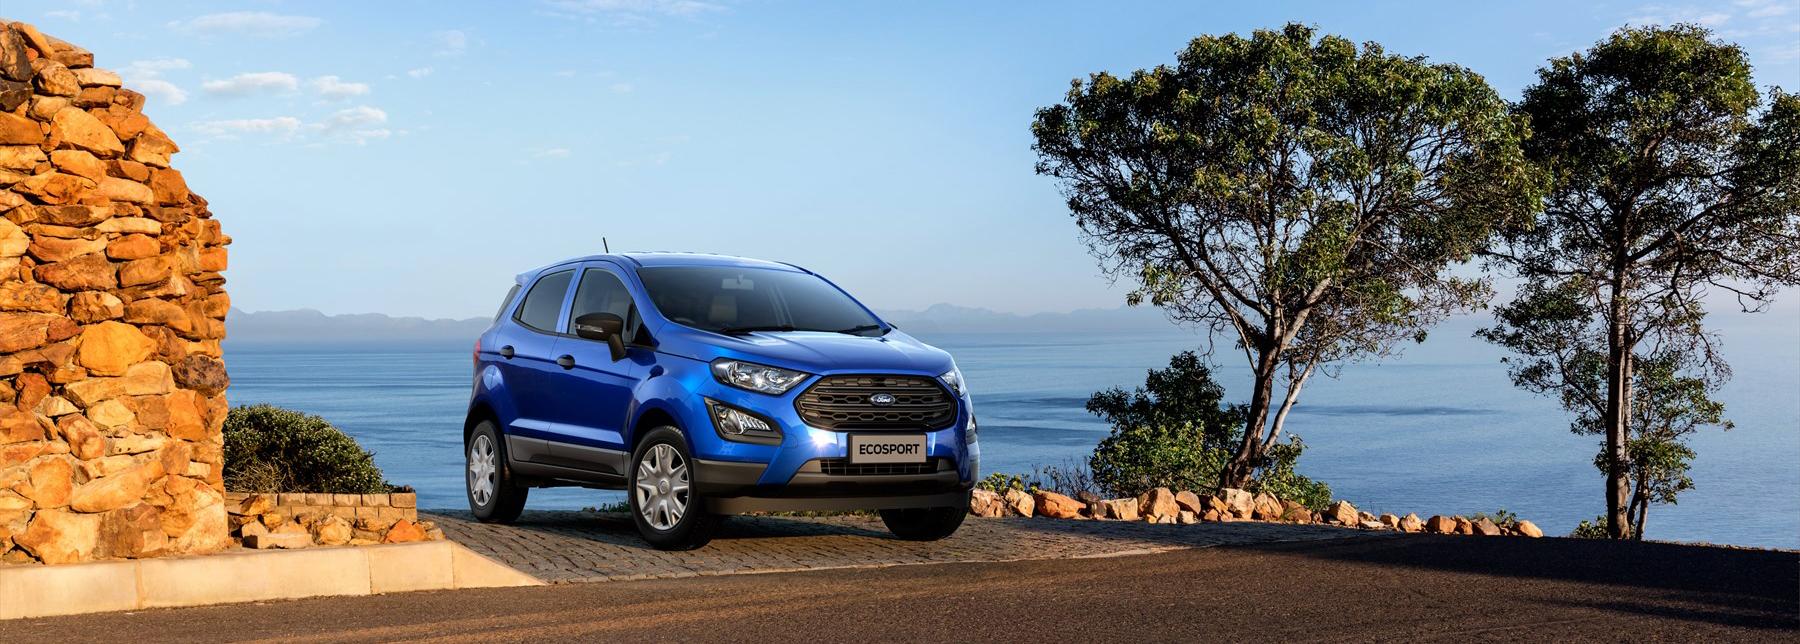 Ford expands EcoSport range